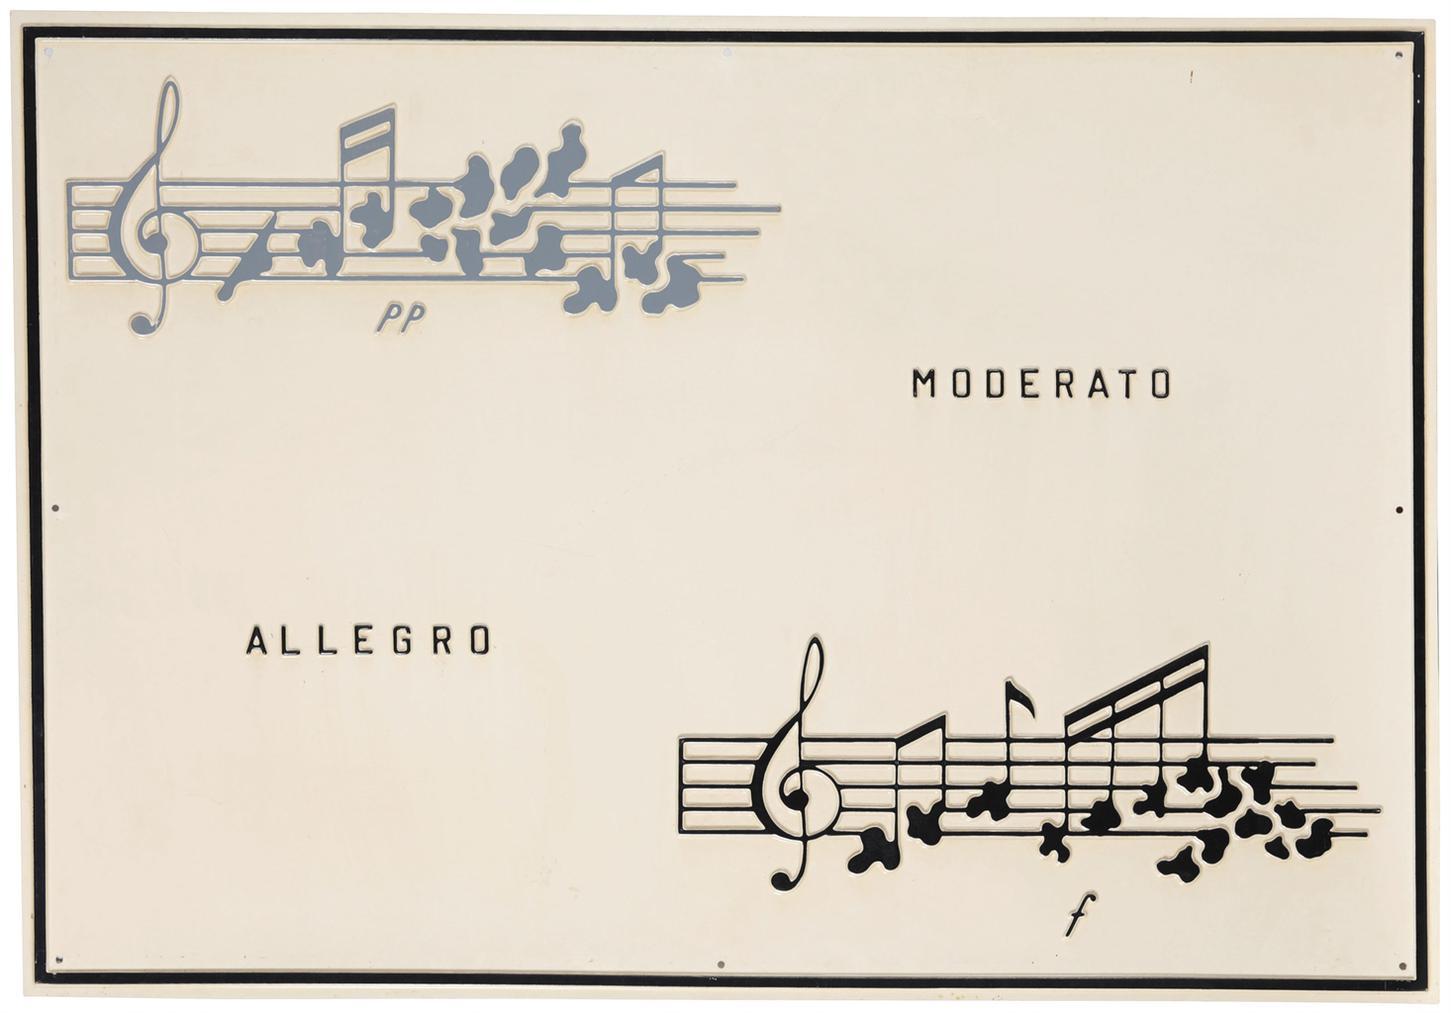 Marcel Broodthaers-Allegro Moderato-1969